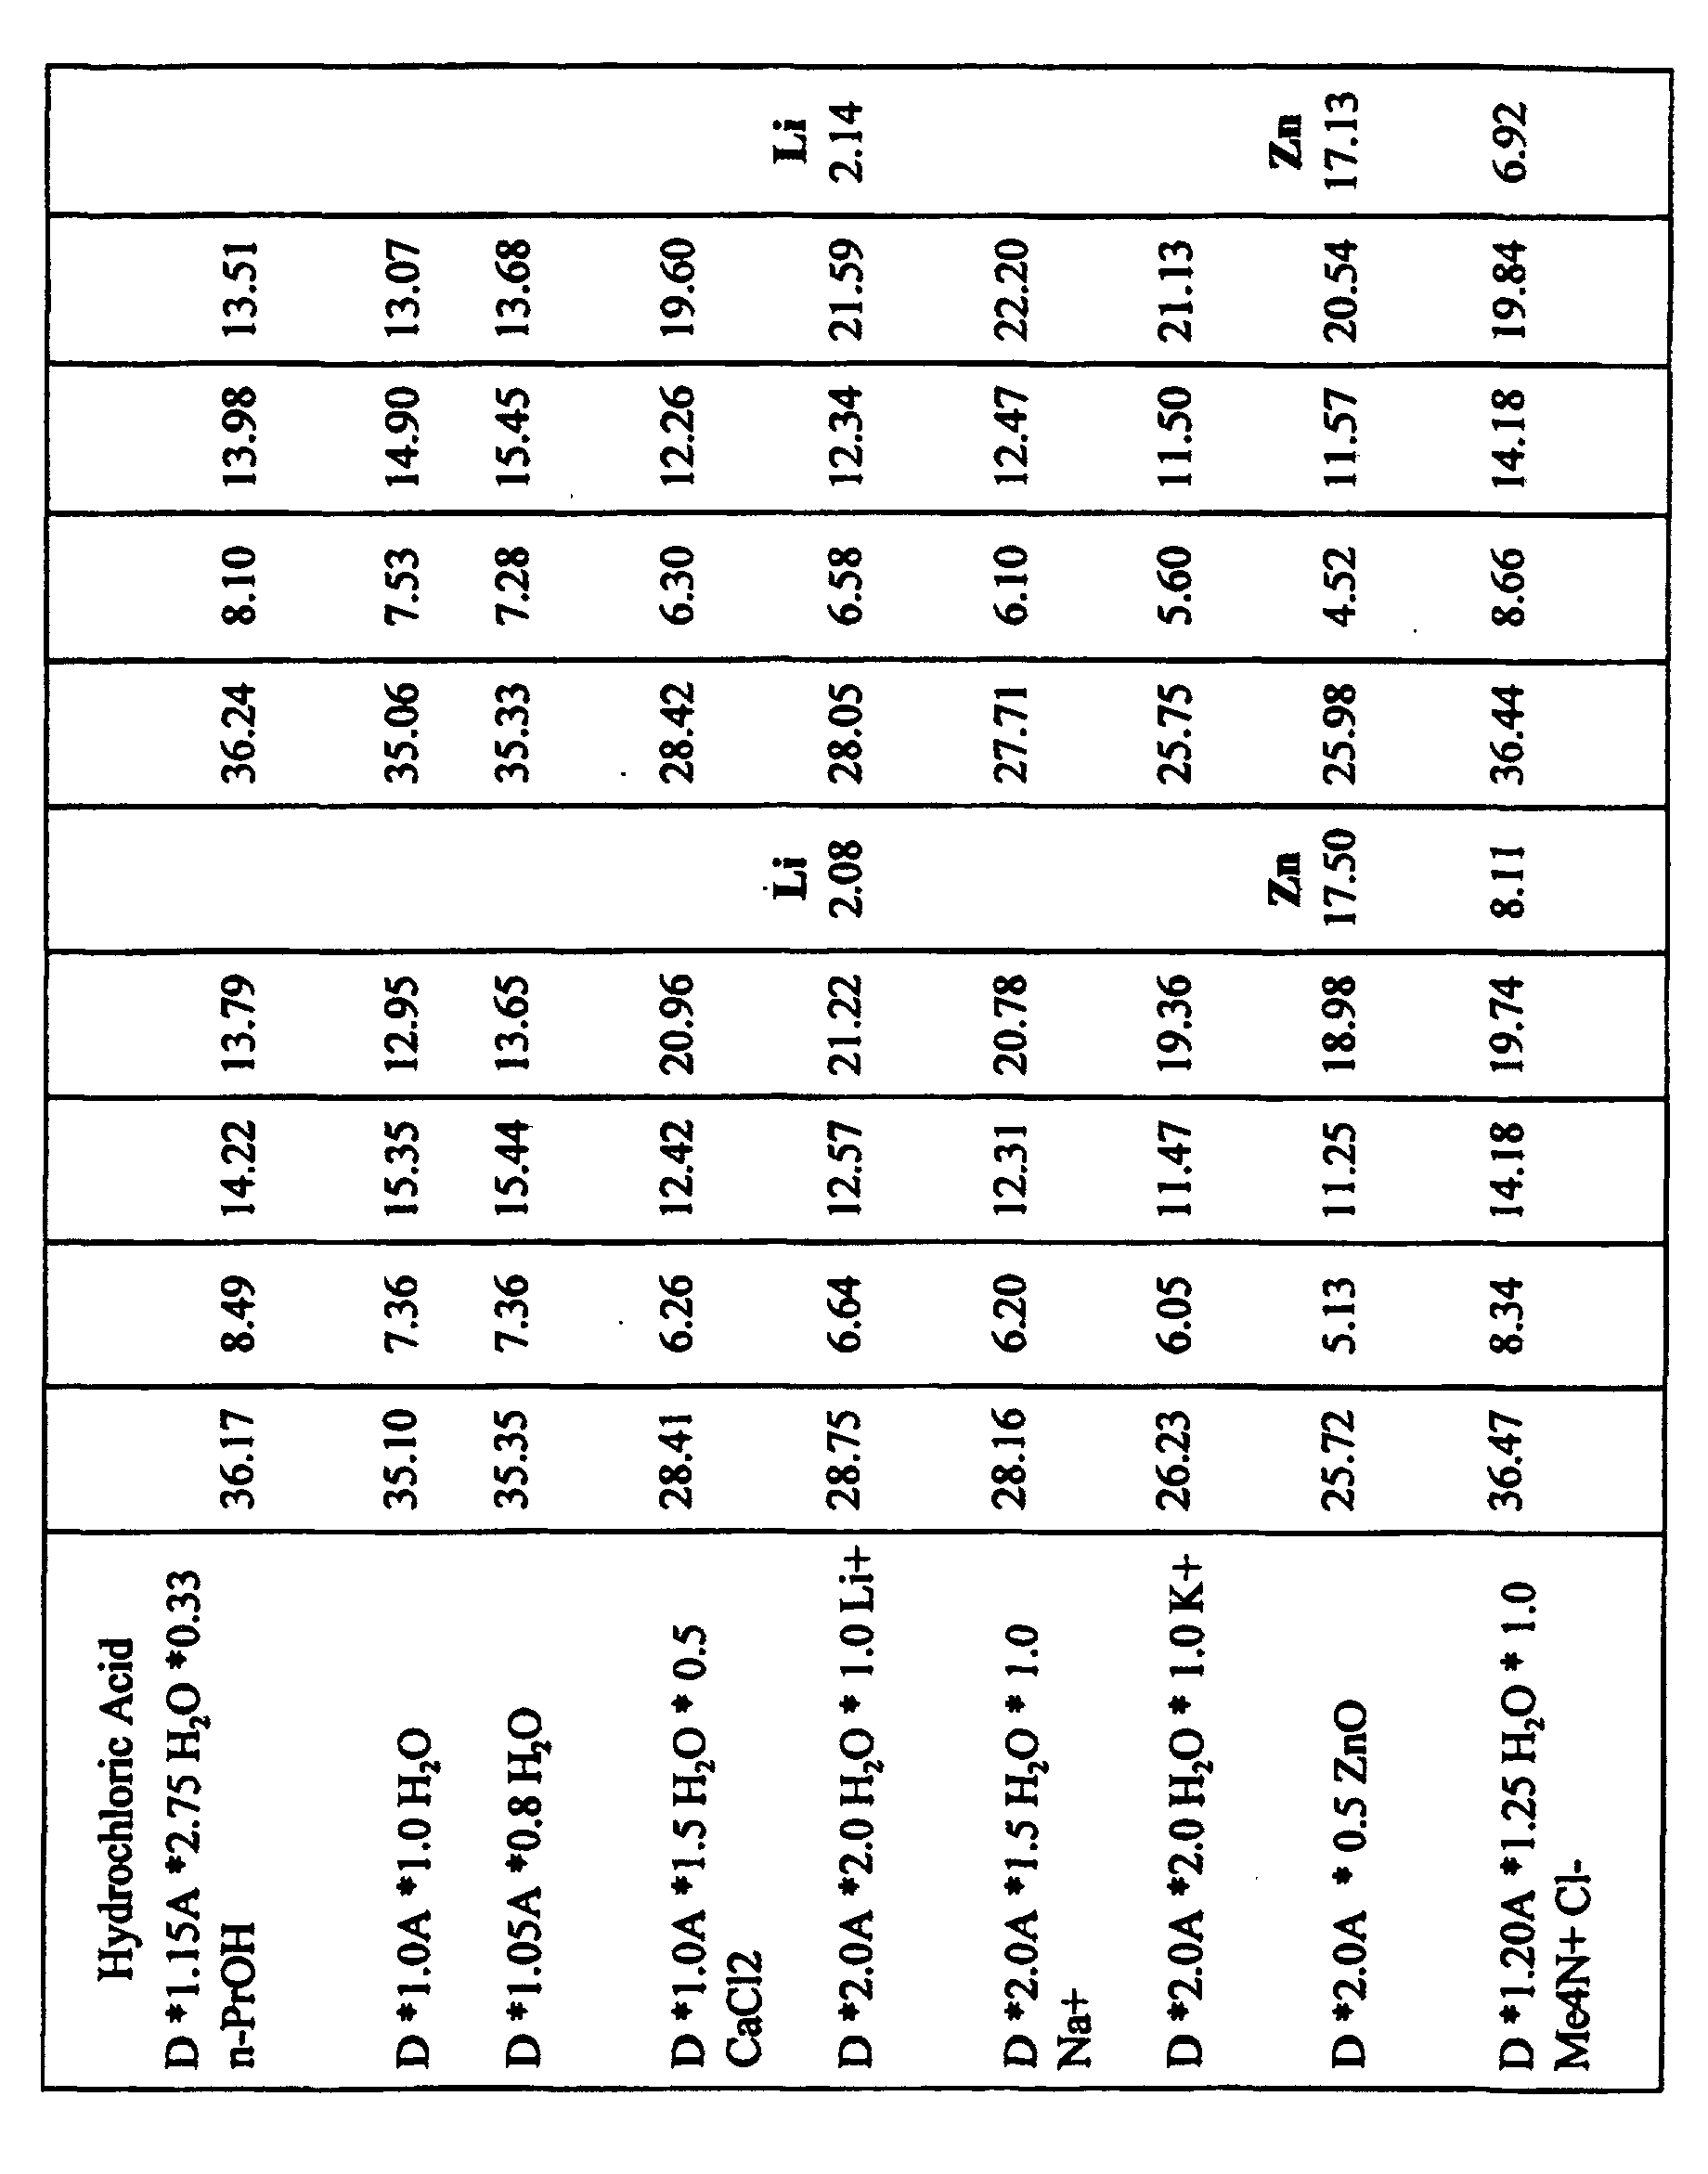 ep1265860b1 amidino compound and salts thereof useful as nitric rh google com